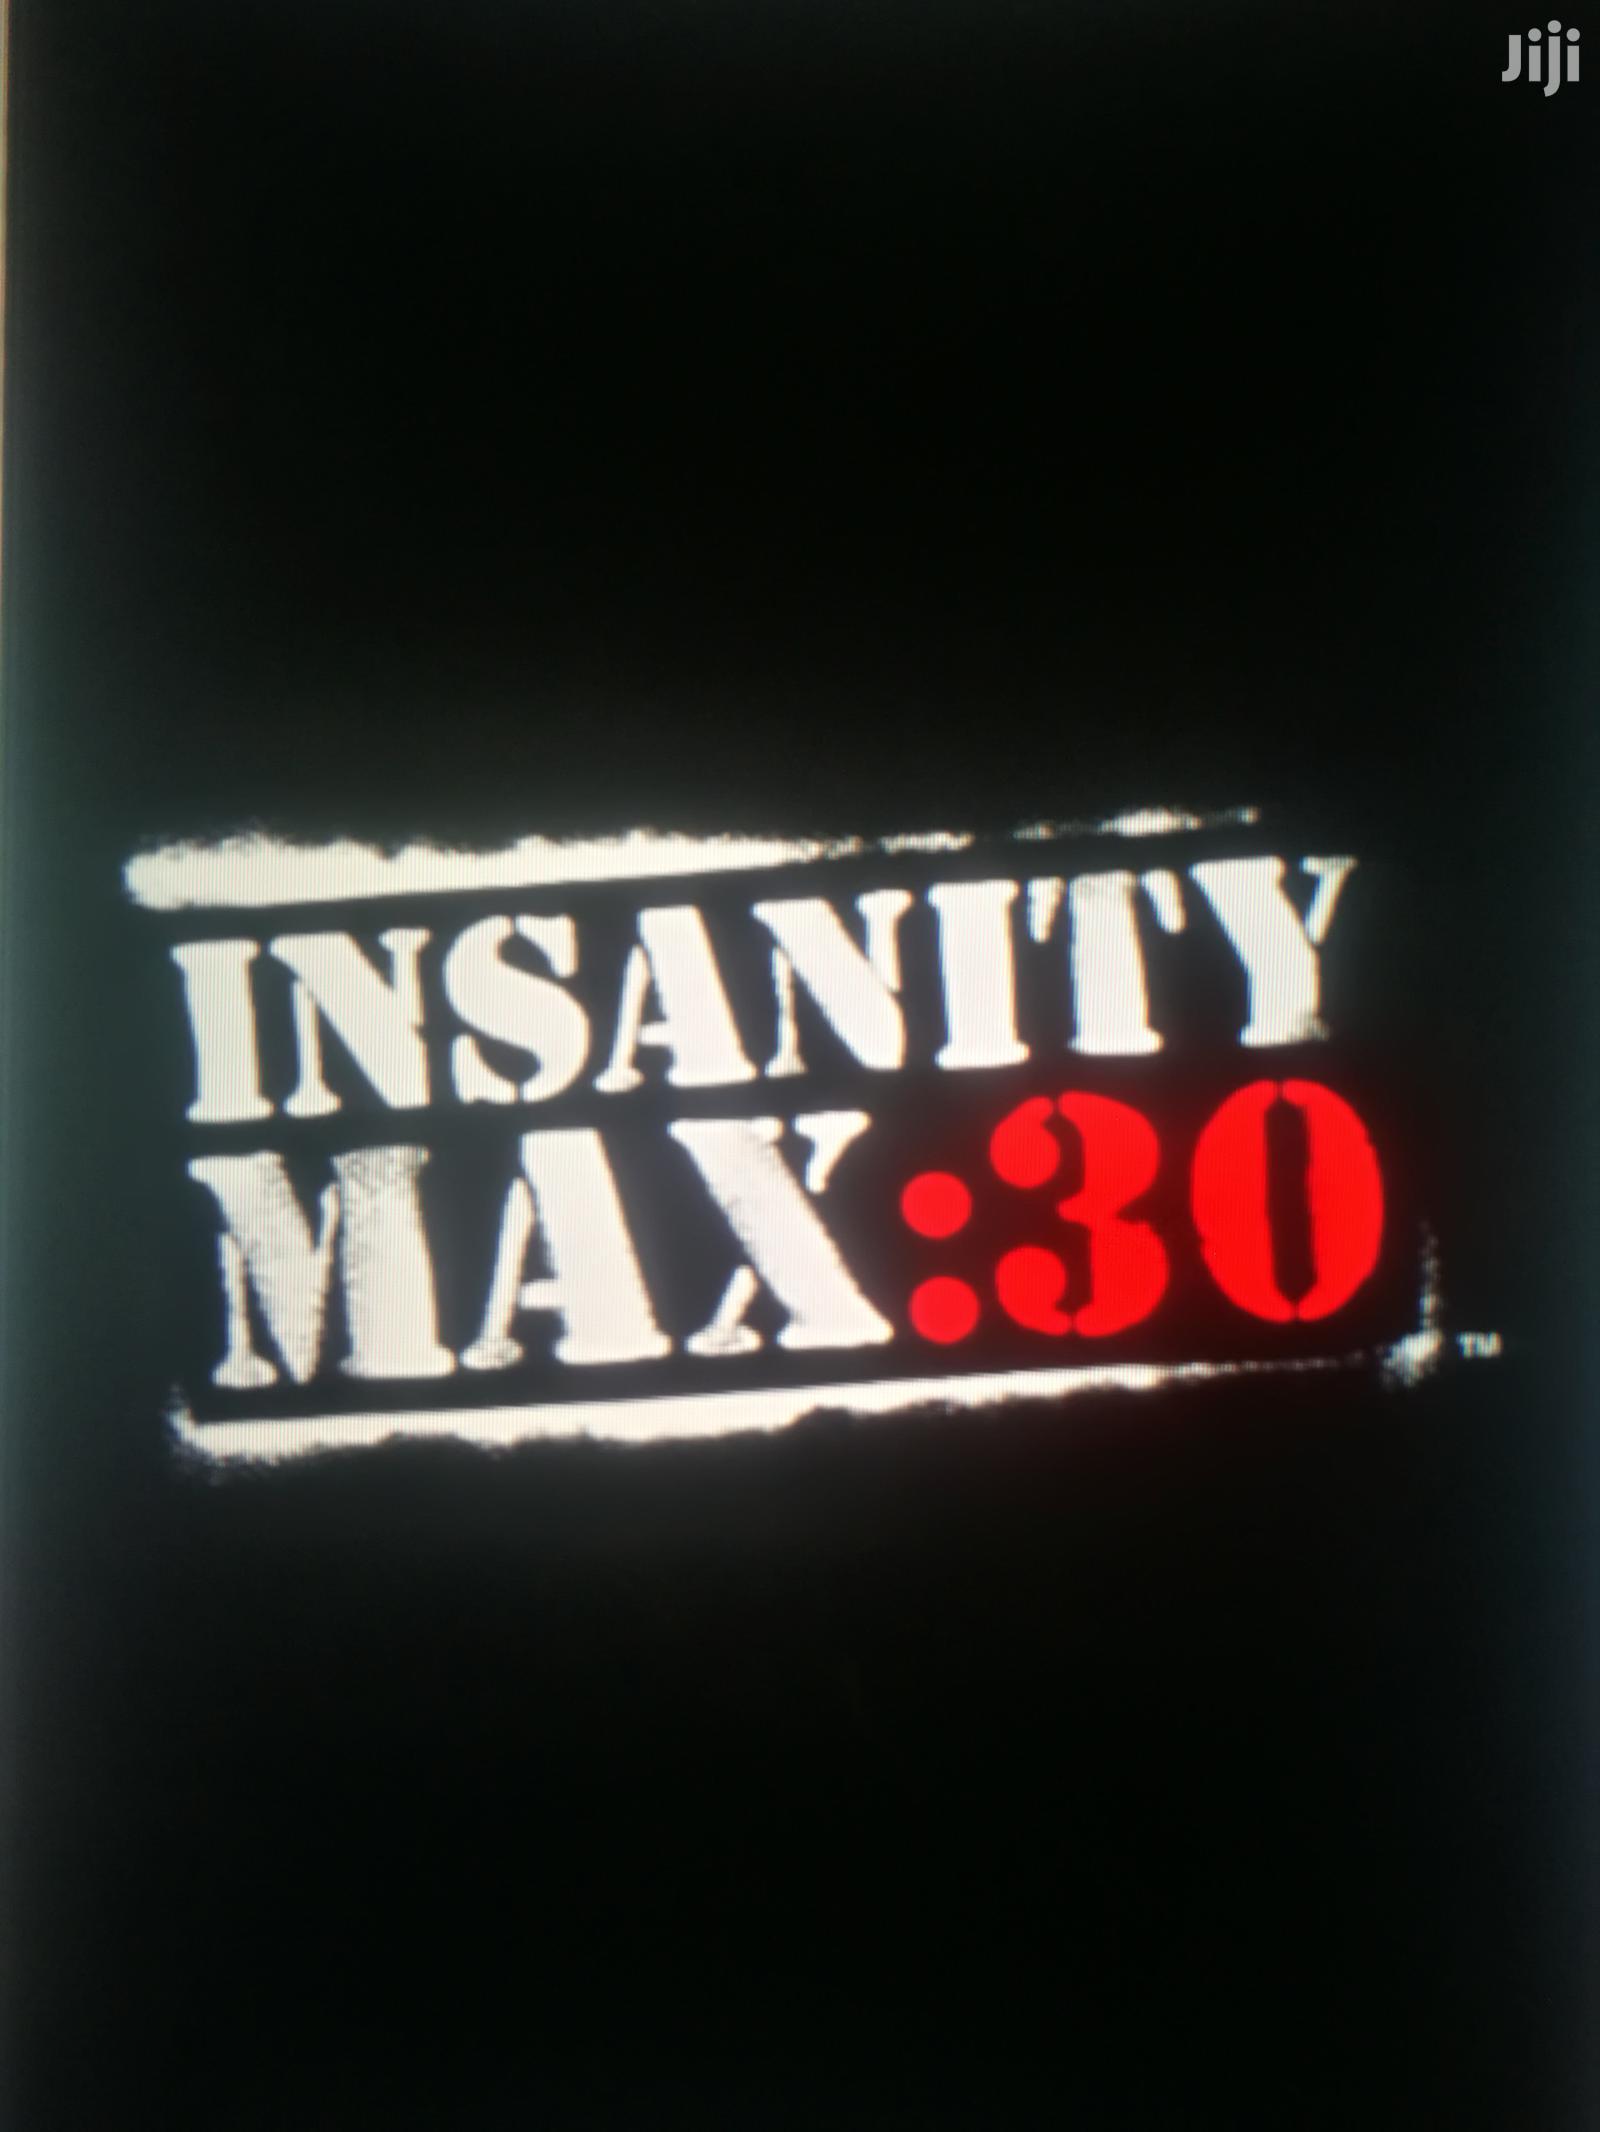 Insanitymax 30/ P90x Home Workout Videos